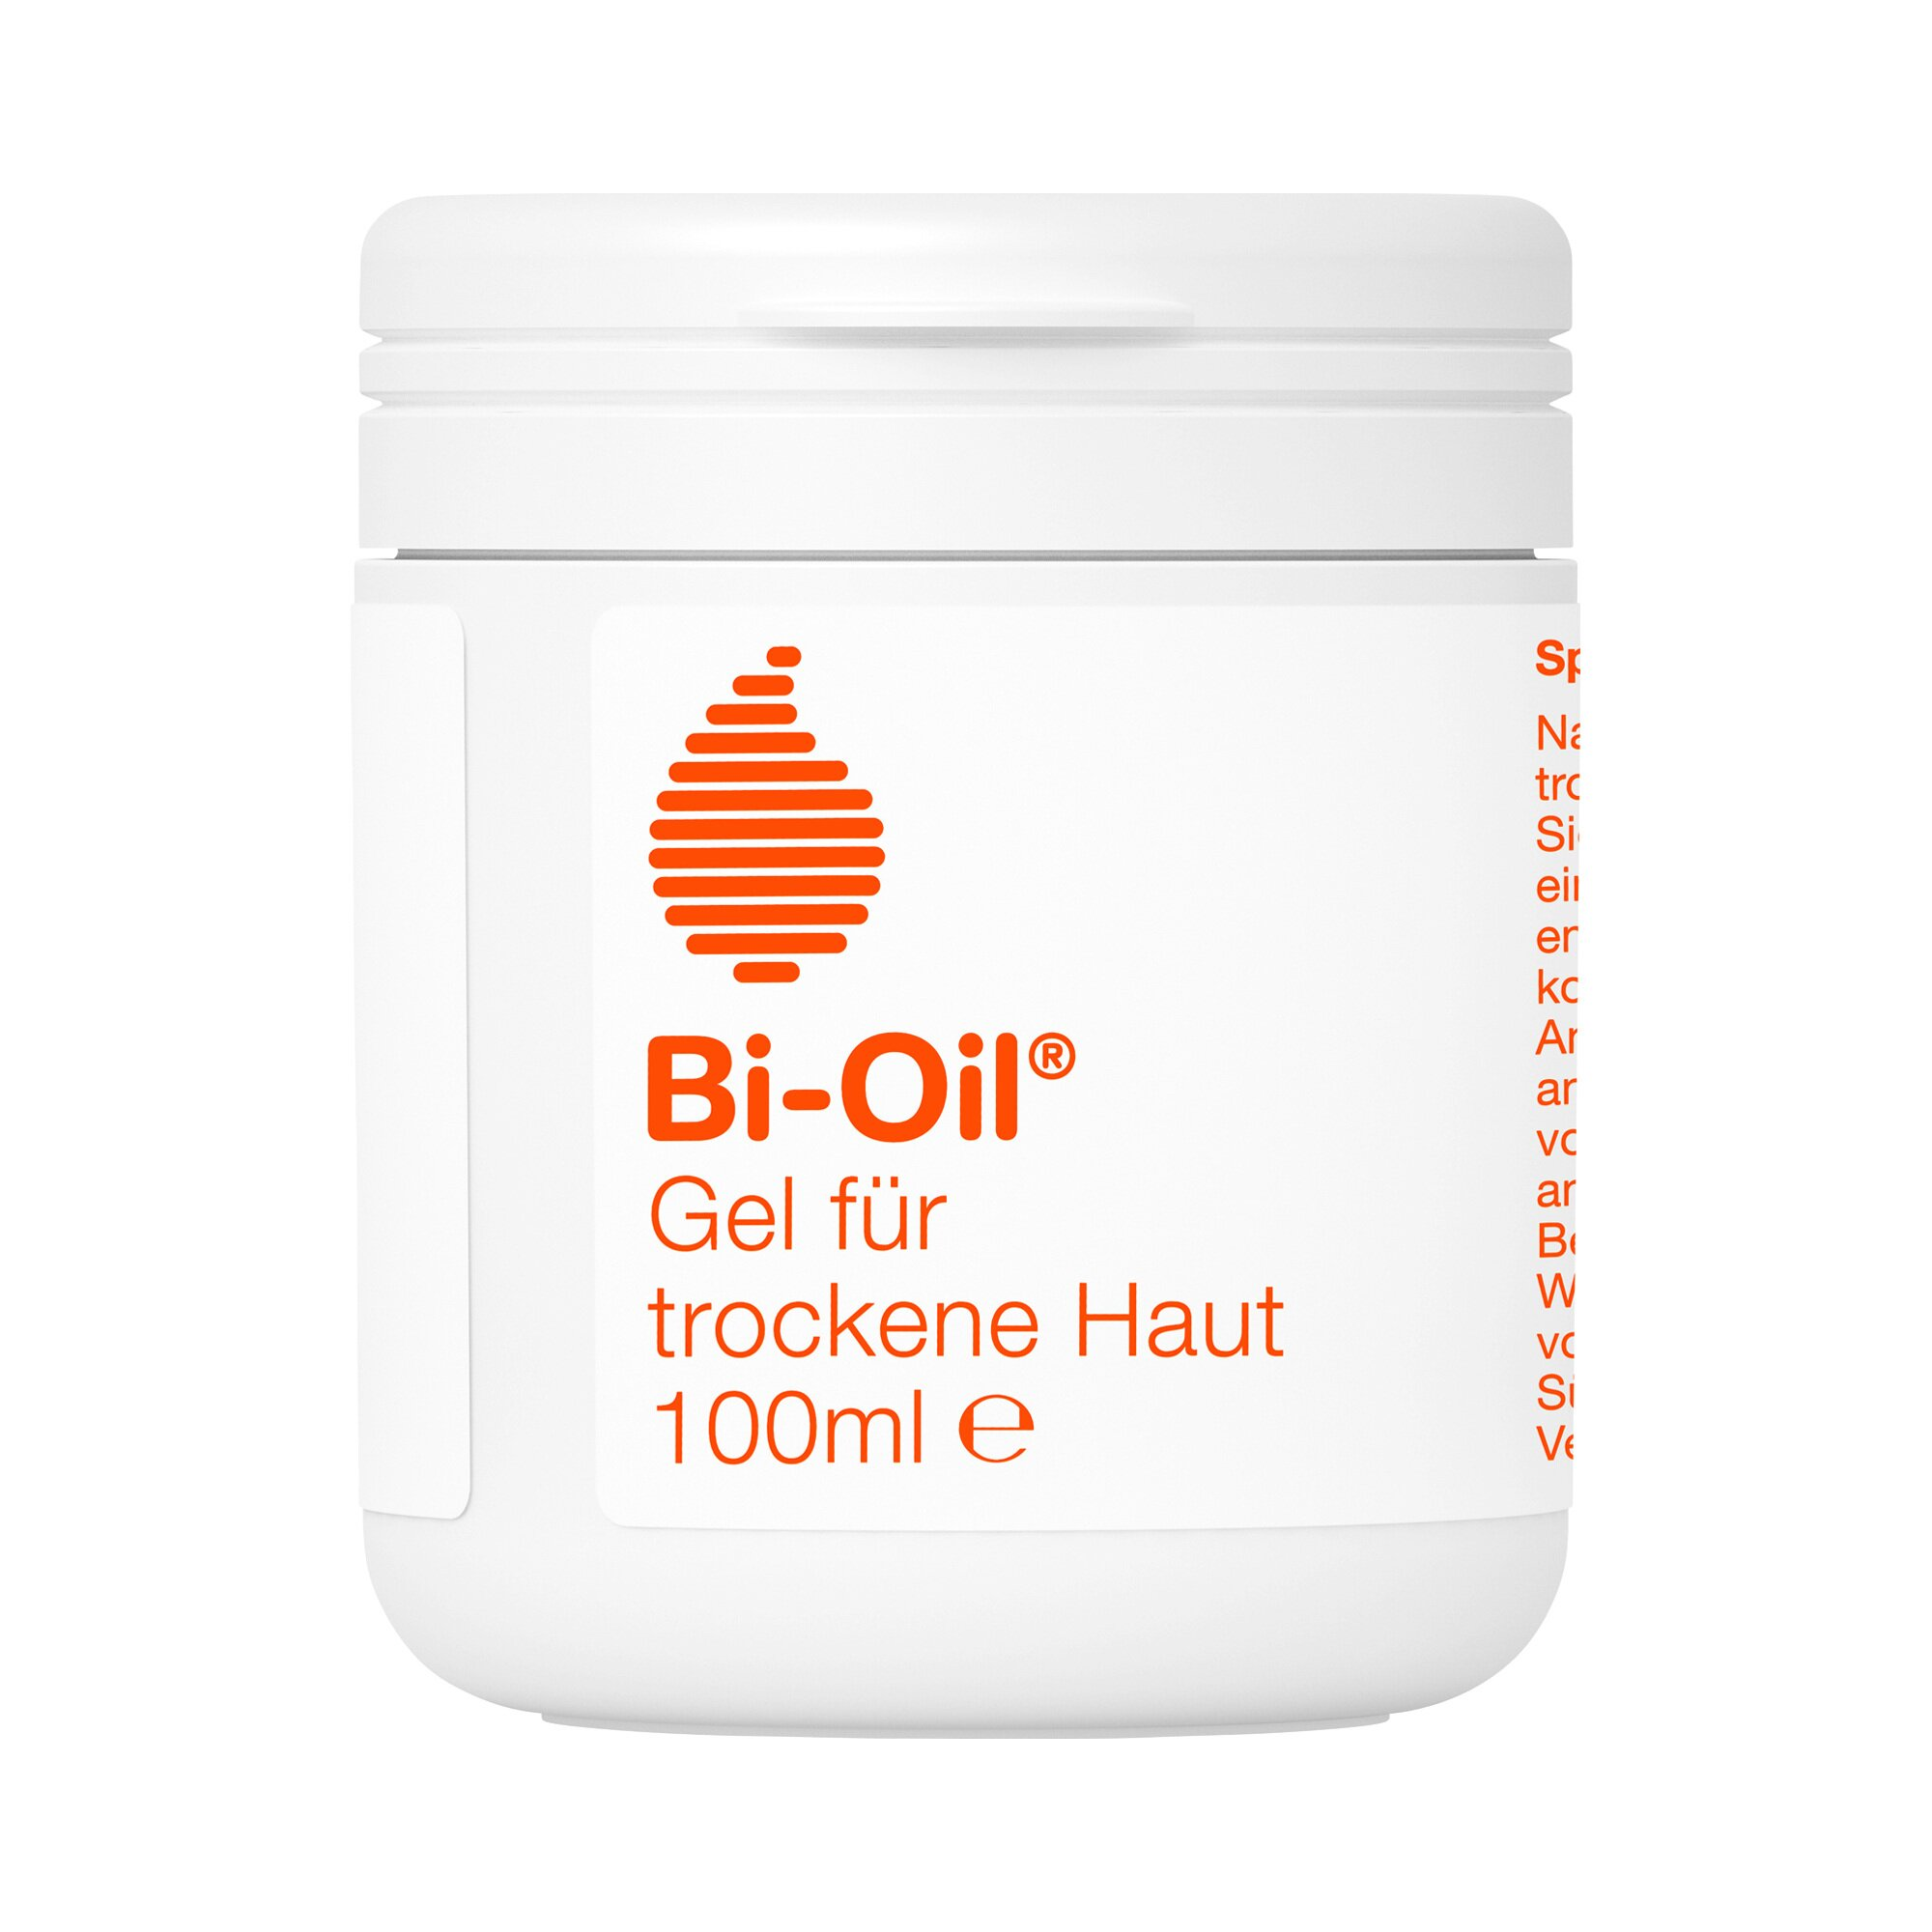 Bi-Oil Bi-Oil Gel